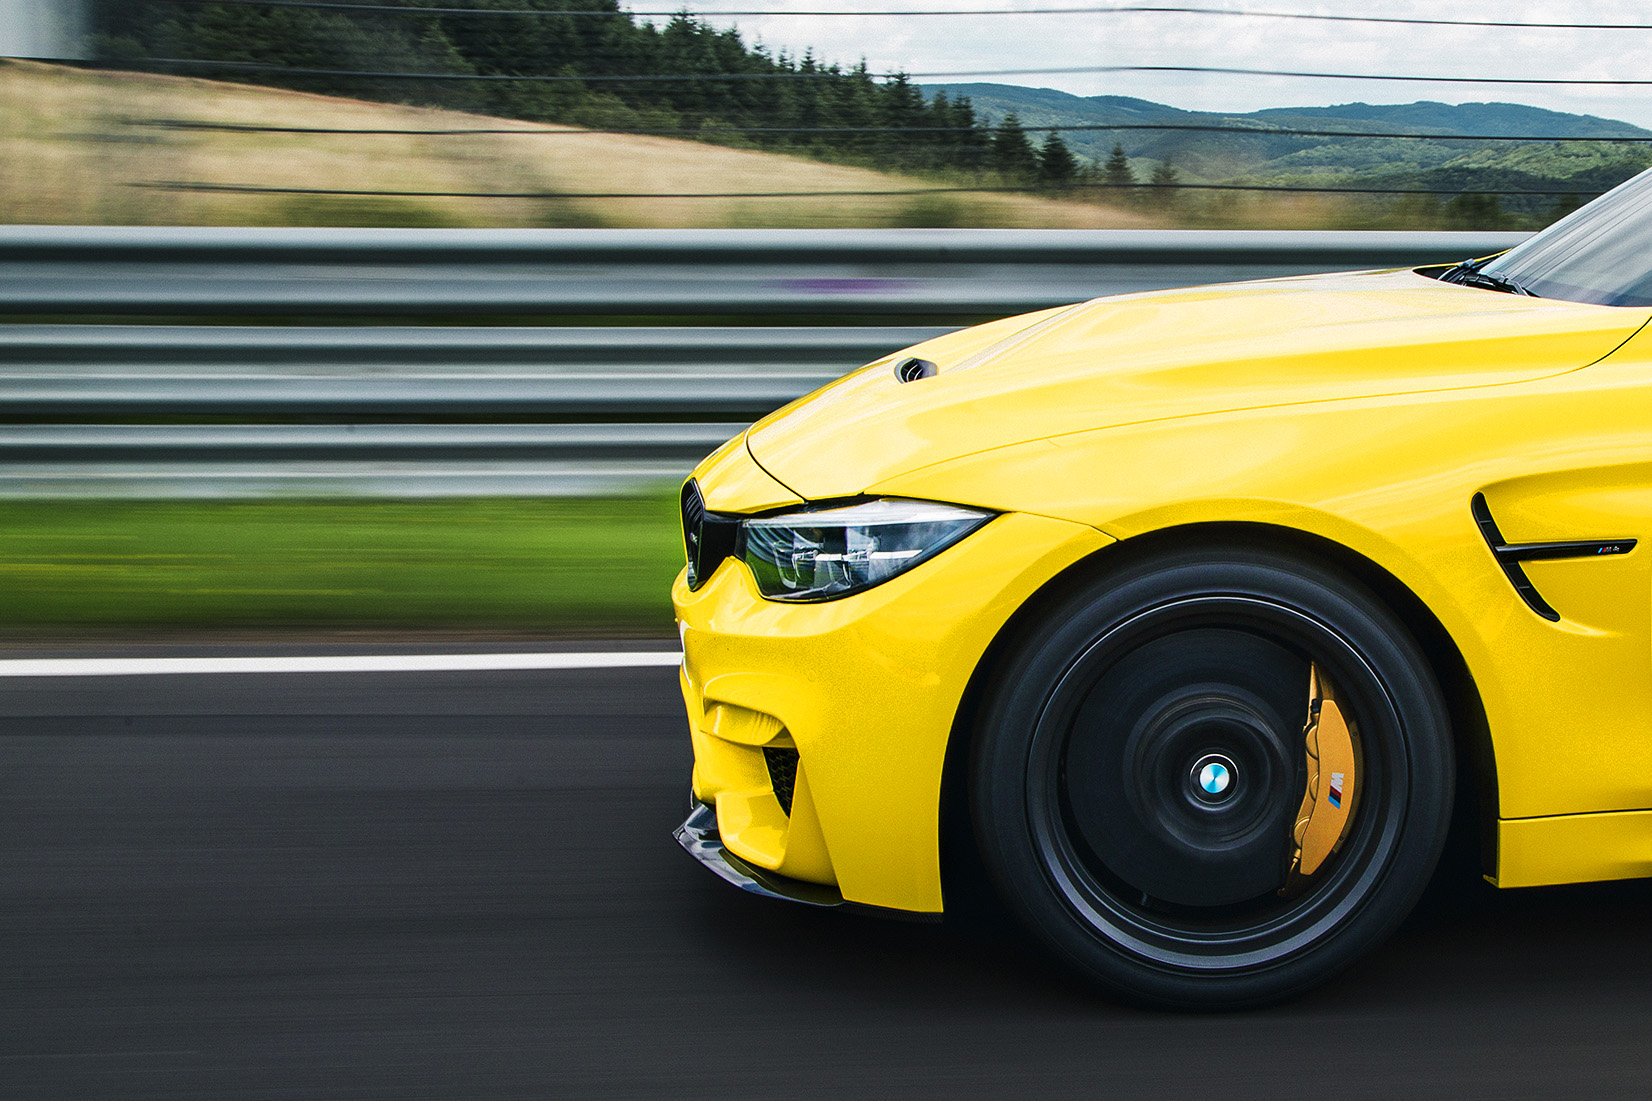 BMW-NRing-03.jpg